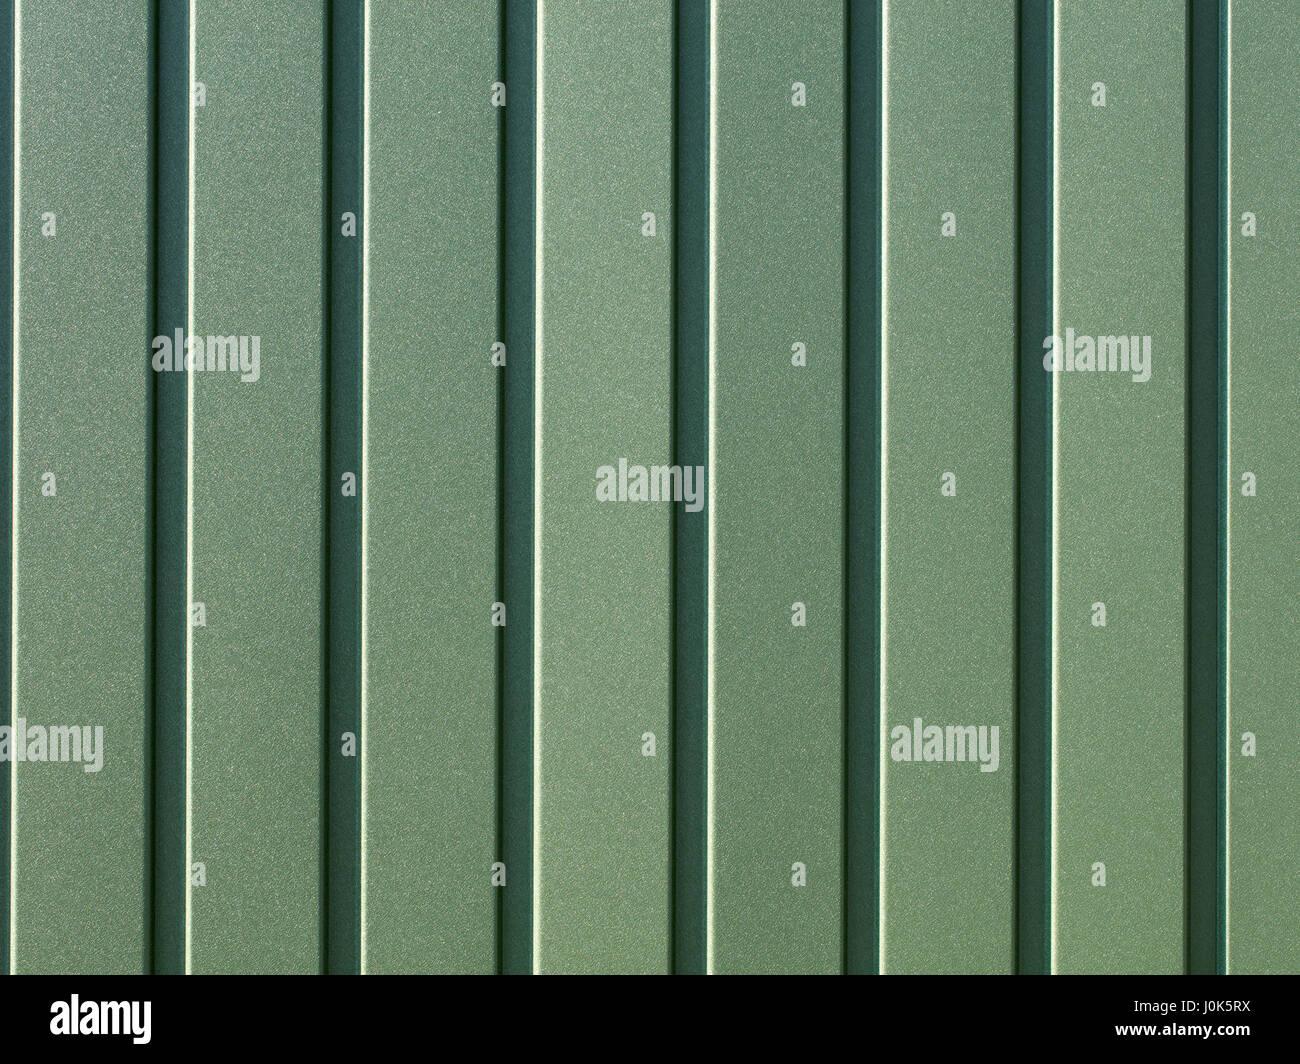 Grün metallic Zaun aus Wellpappe aus Stahlblech mit